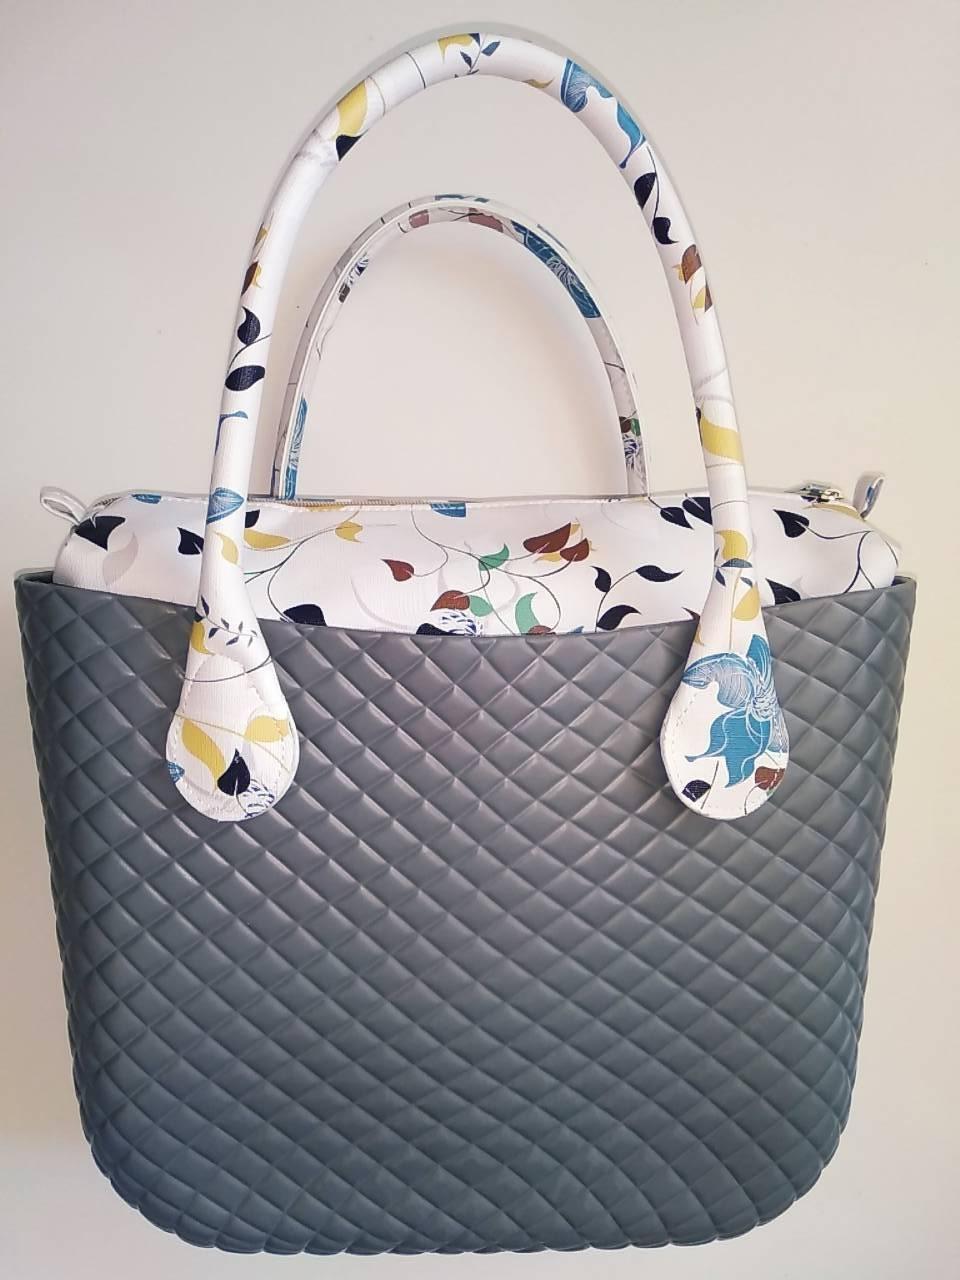 aa3a817e5543 Сумка IQ bag Line серый, цена 990 грн., купить Дніпро — Prom.ua (ID ...